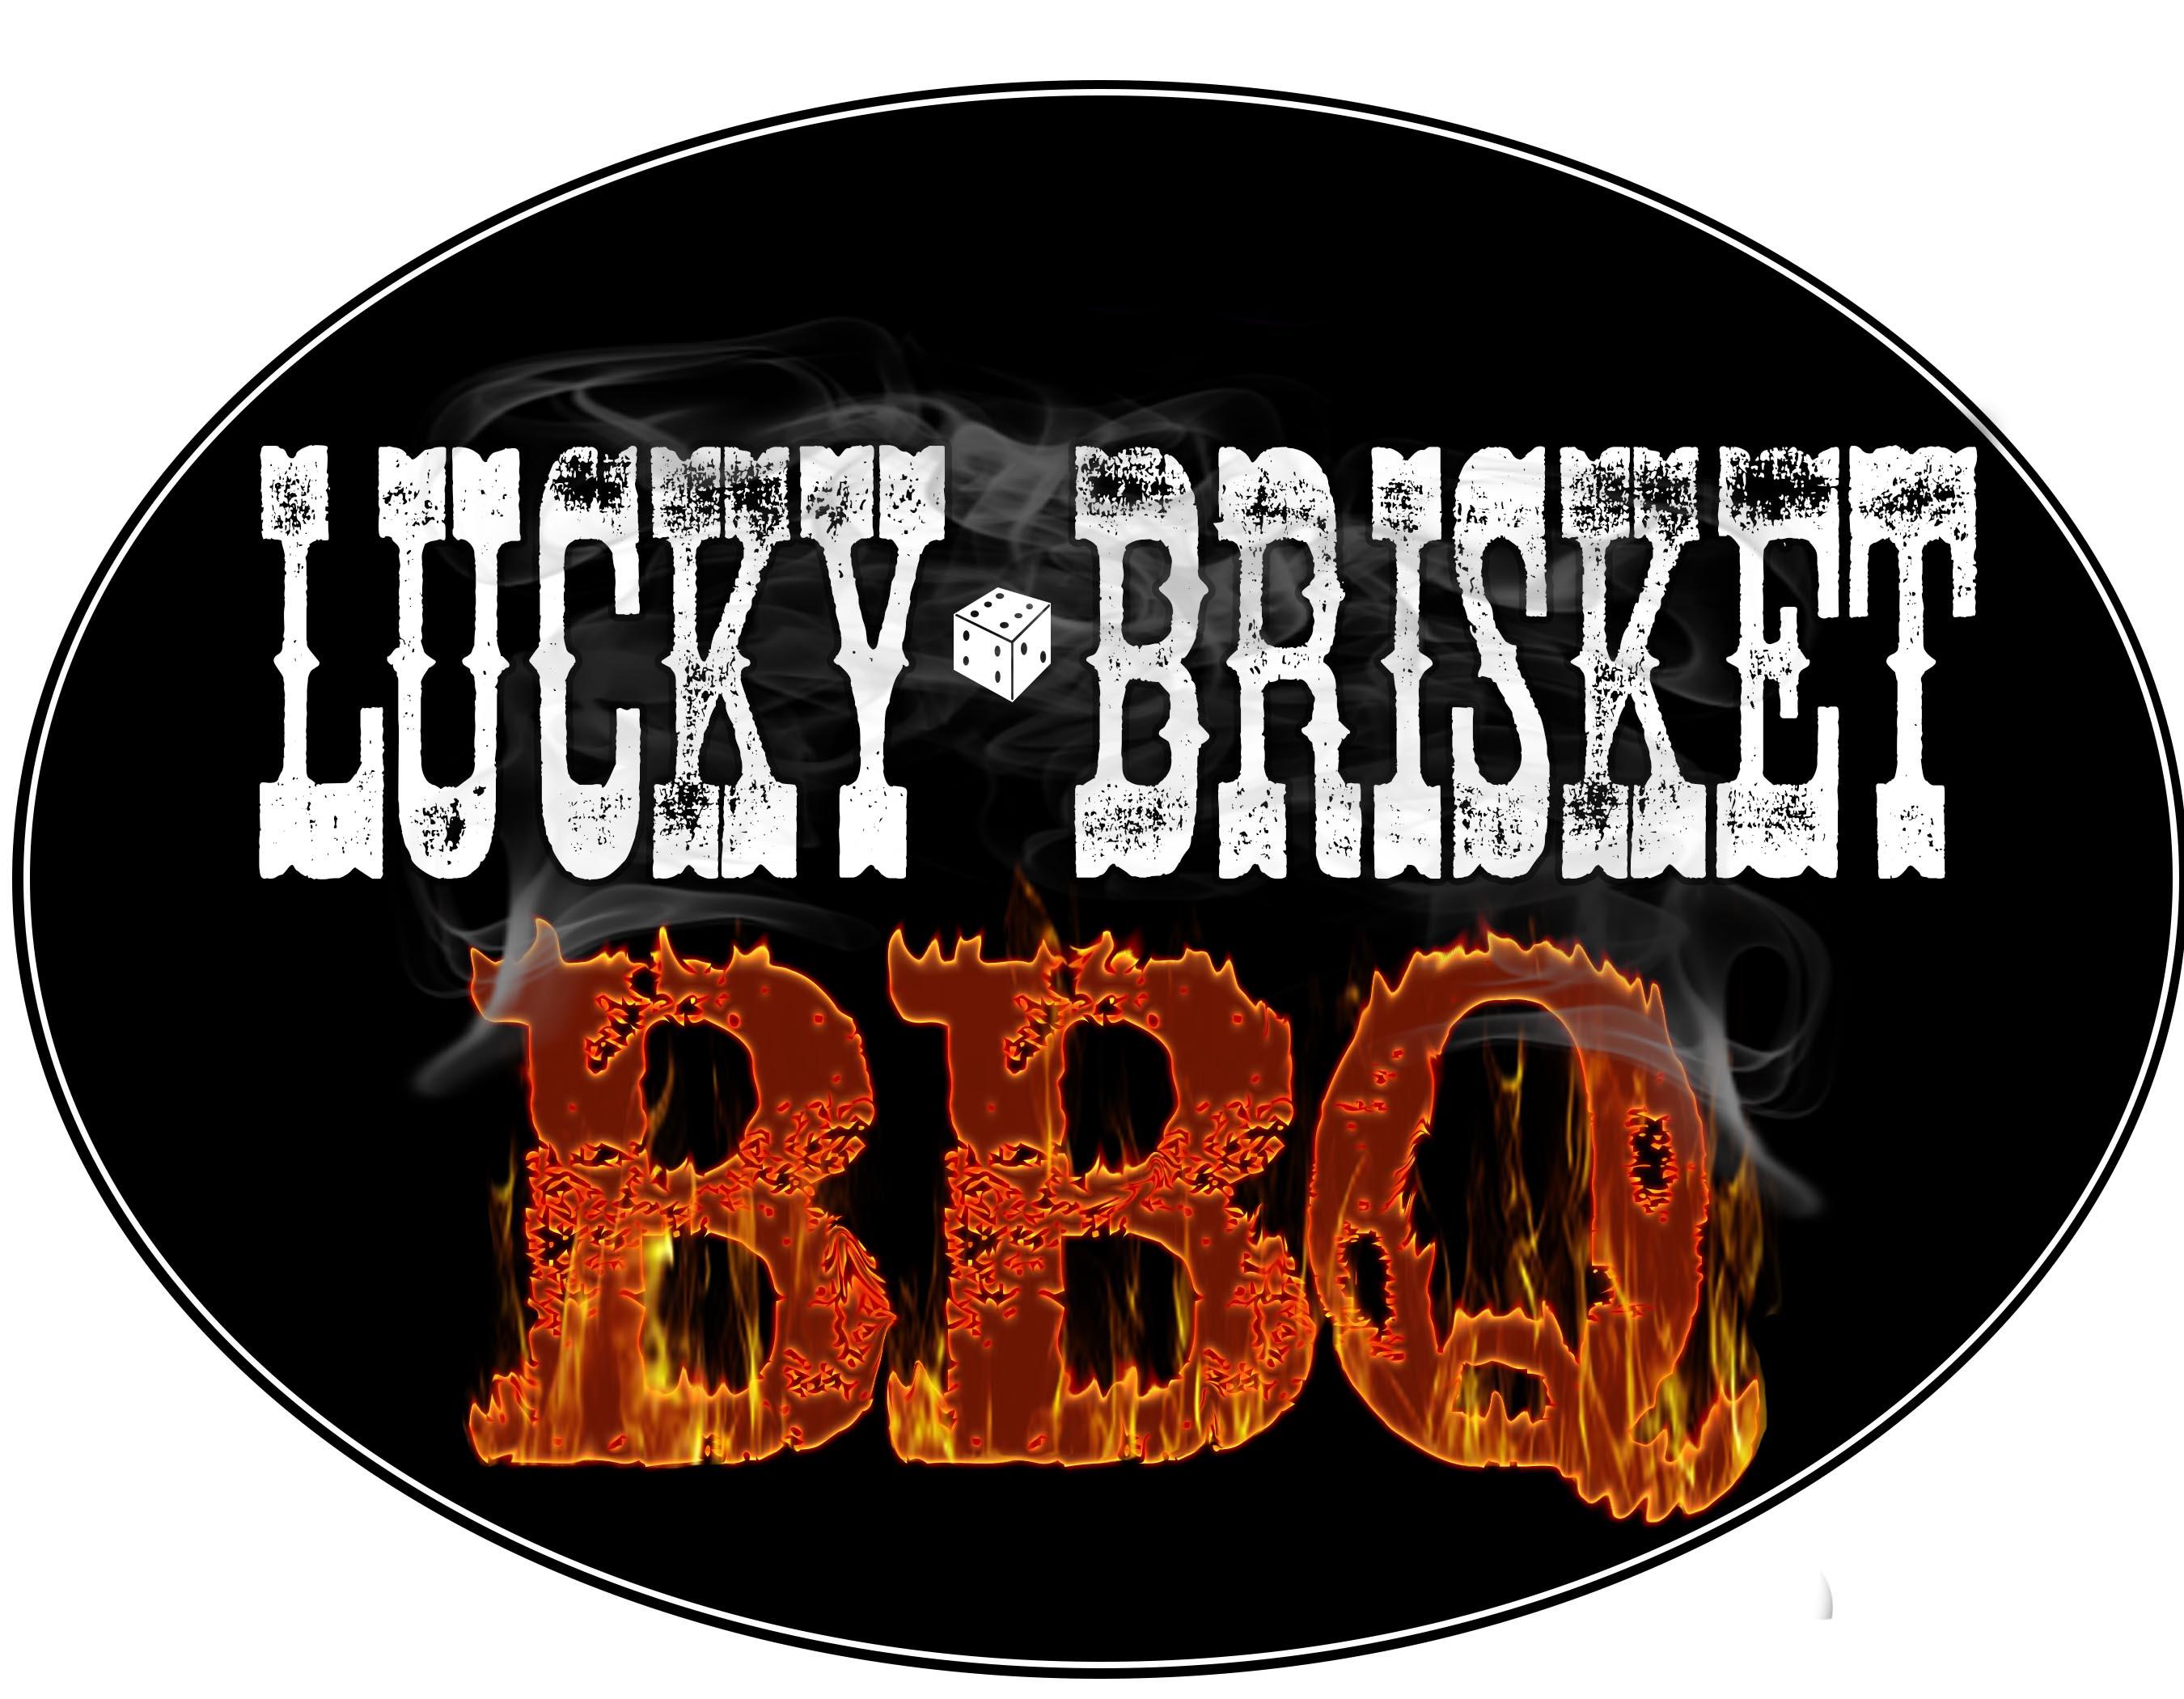 Lucky Brisket BBQ